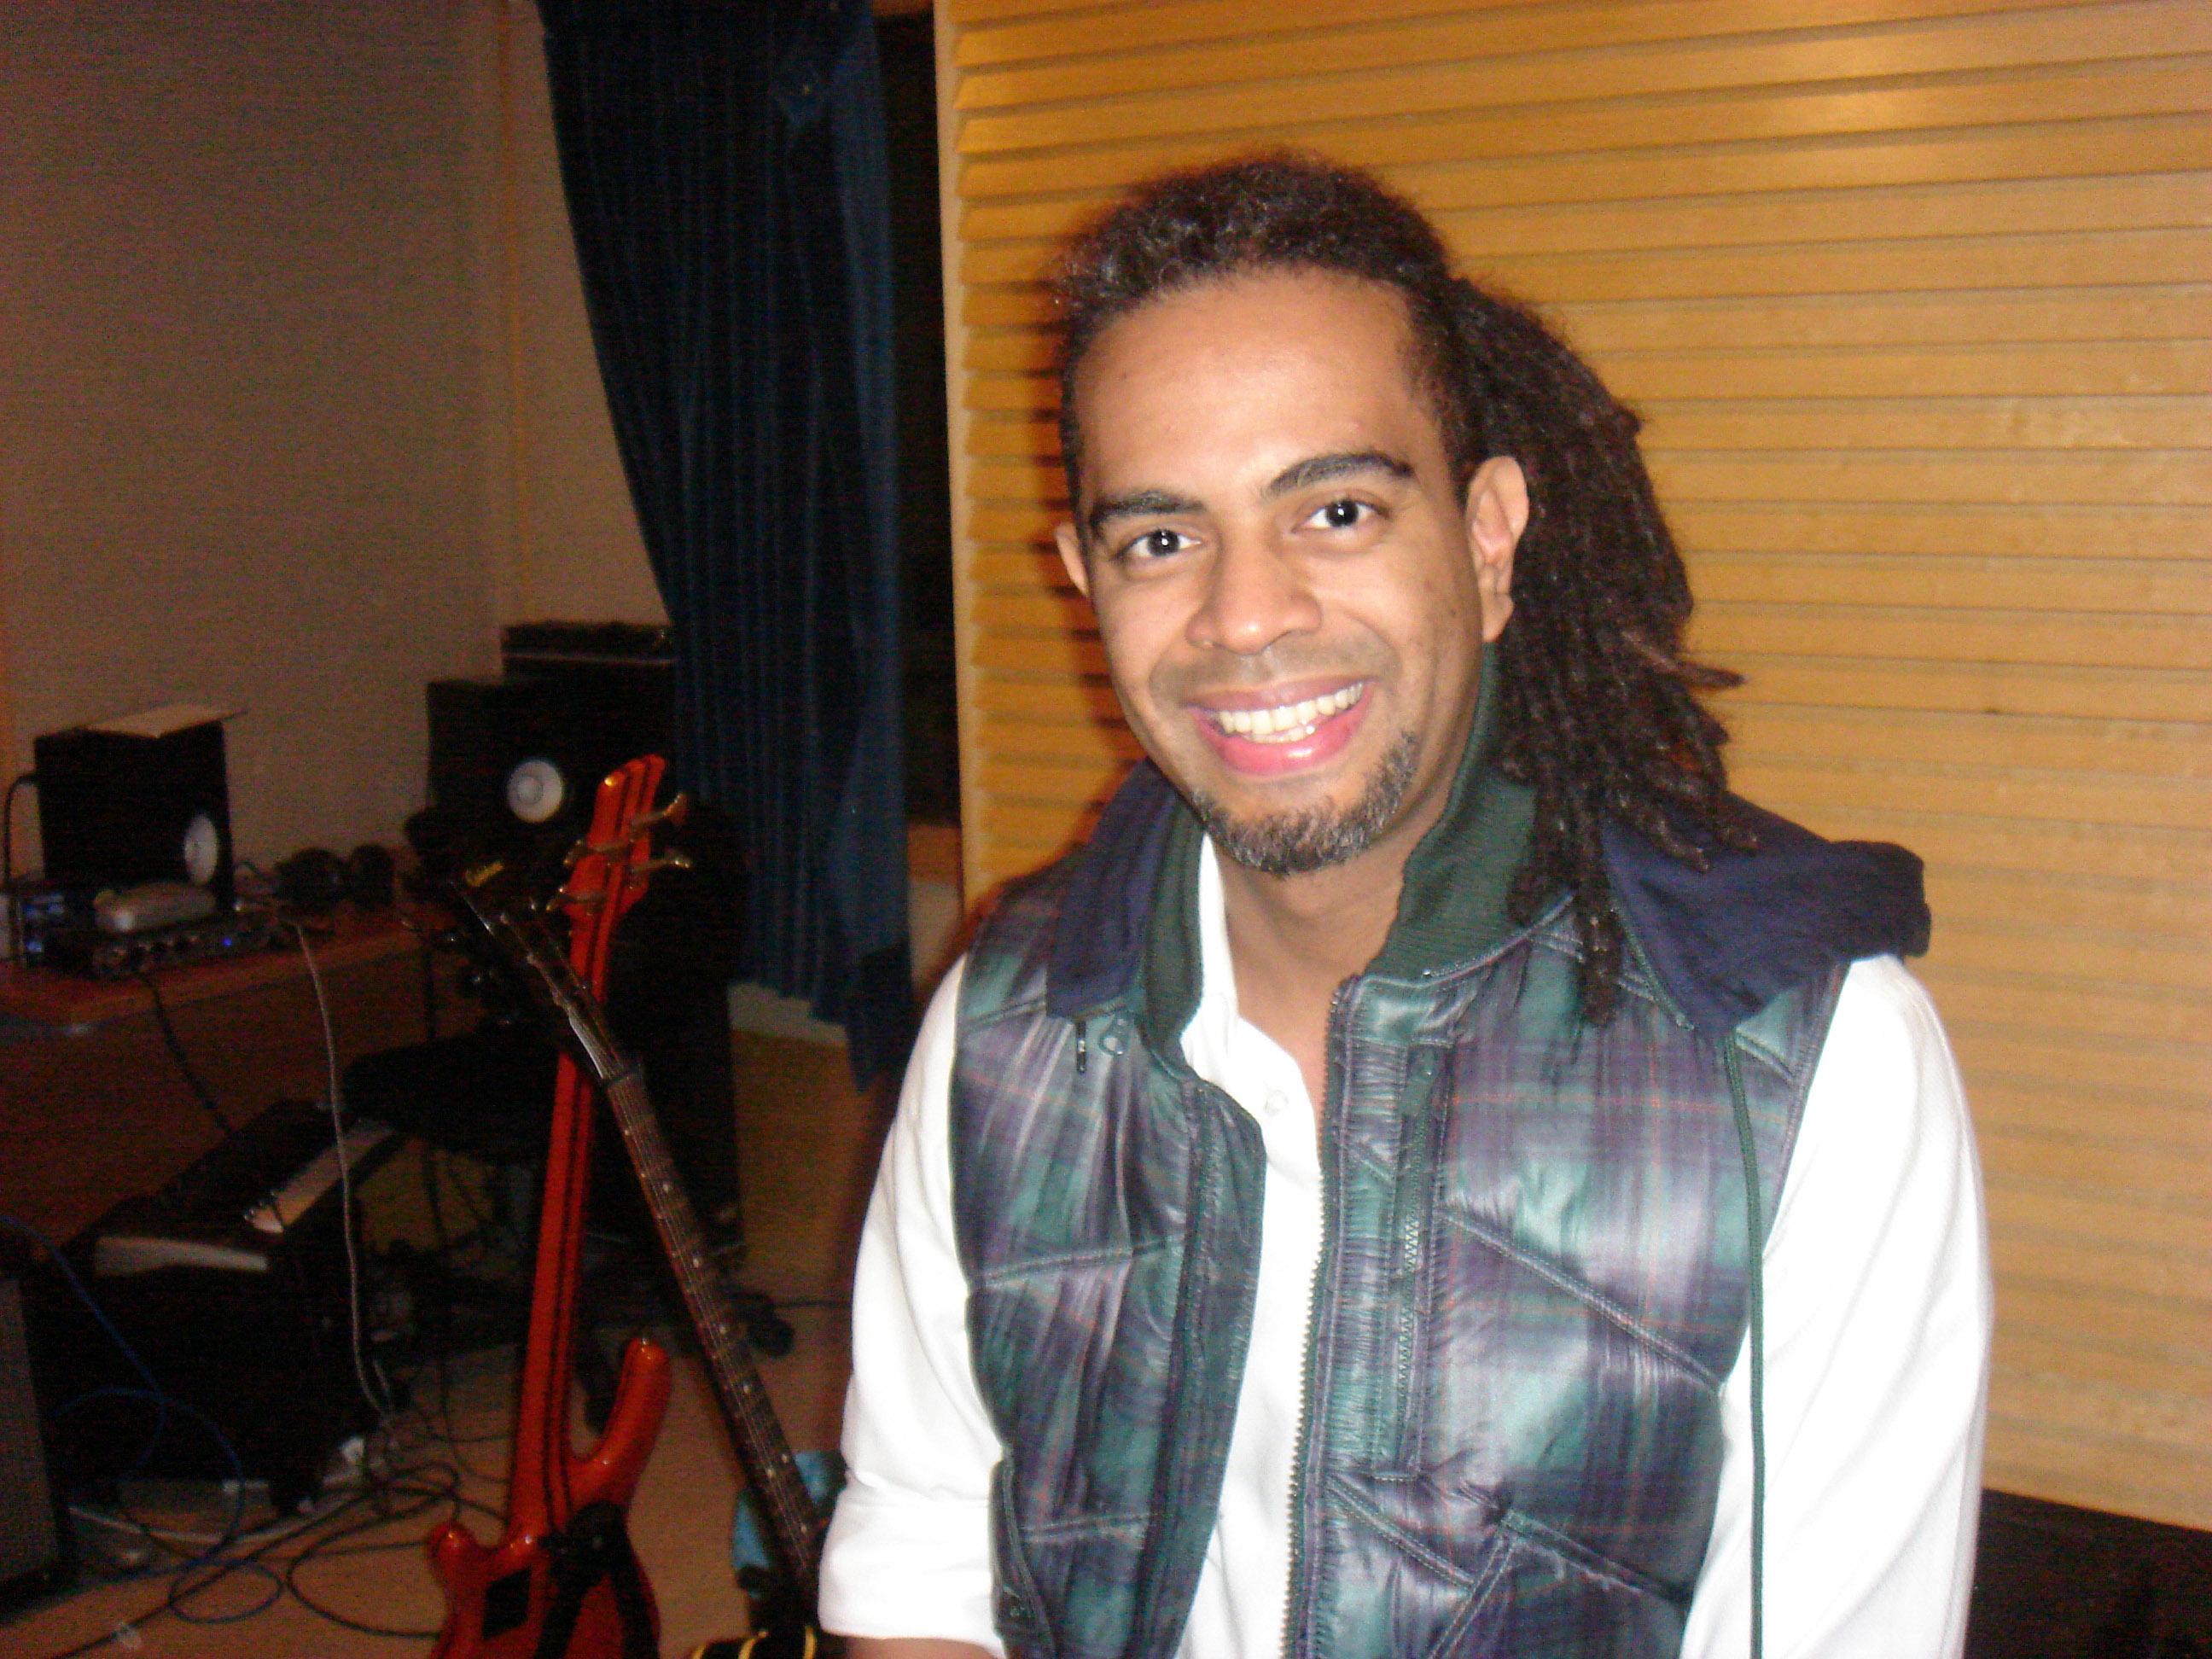 Filho do cantor Jair Rodrigues realiza shows-workshop na USP (foto: Patricia Ogando)